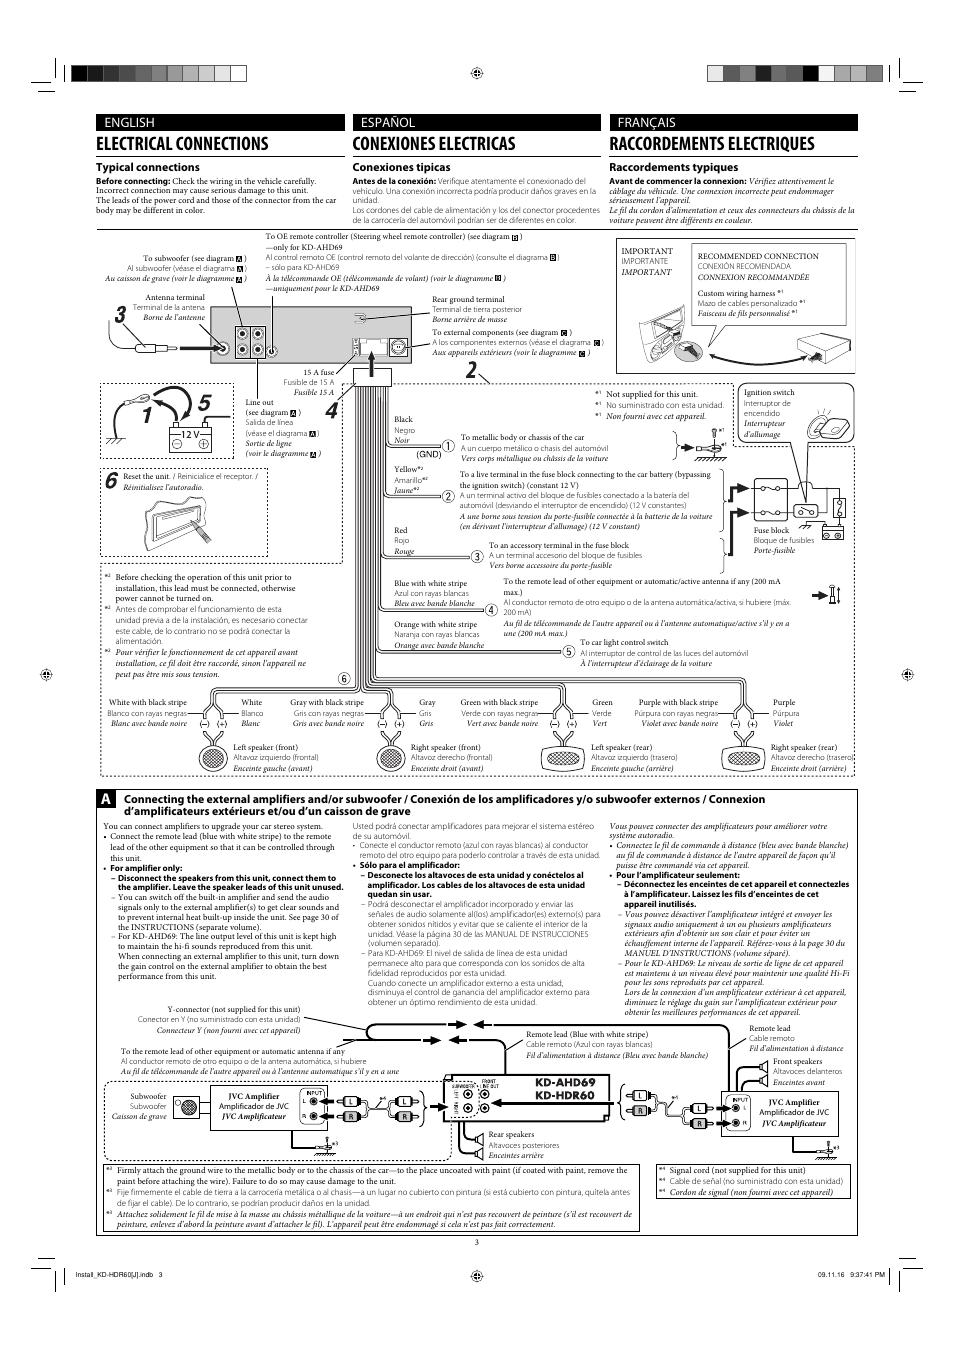 jvc kd ahd69 page3?resize\\=665%2C941 diagrams 683769 jvc kw av60bt wiring diagram 00 civic need help jvc kw-nt3hdt wiring diagram at bakdesigns.co